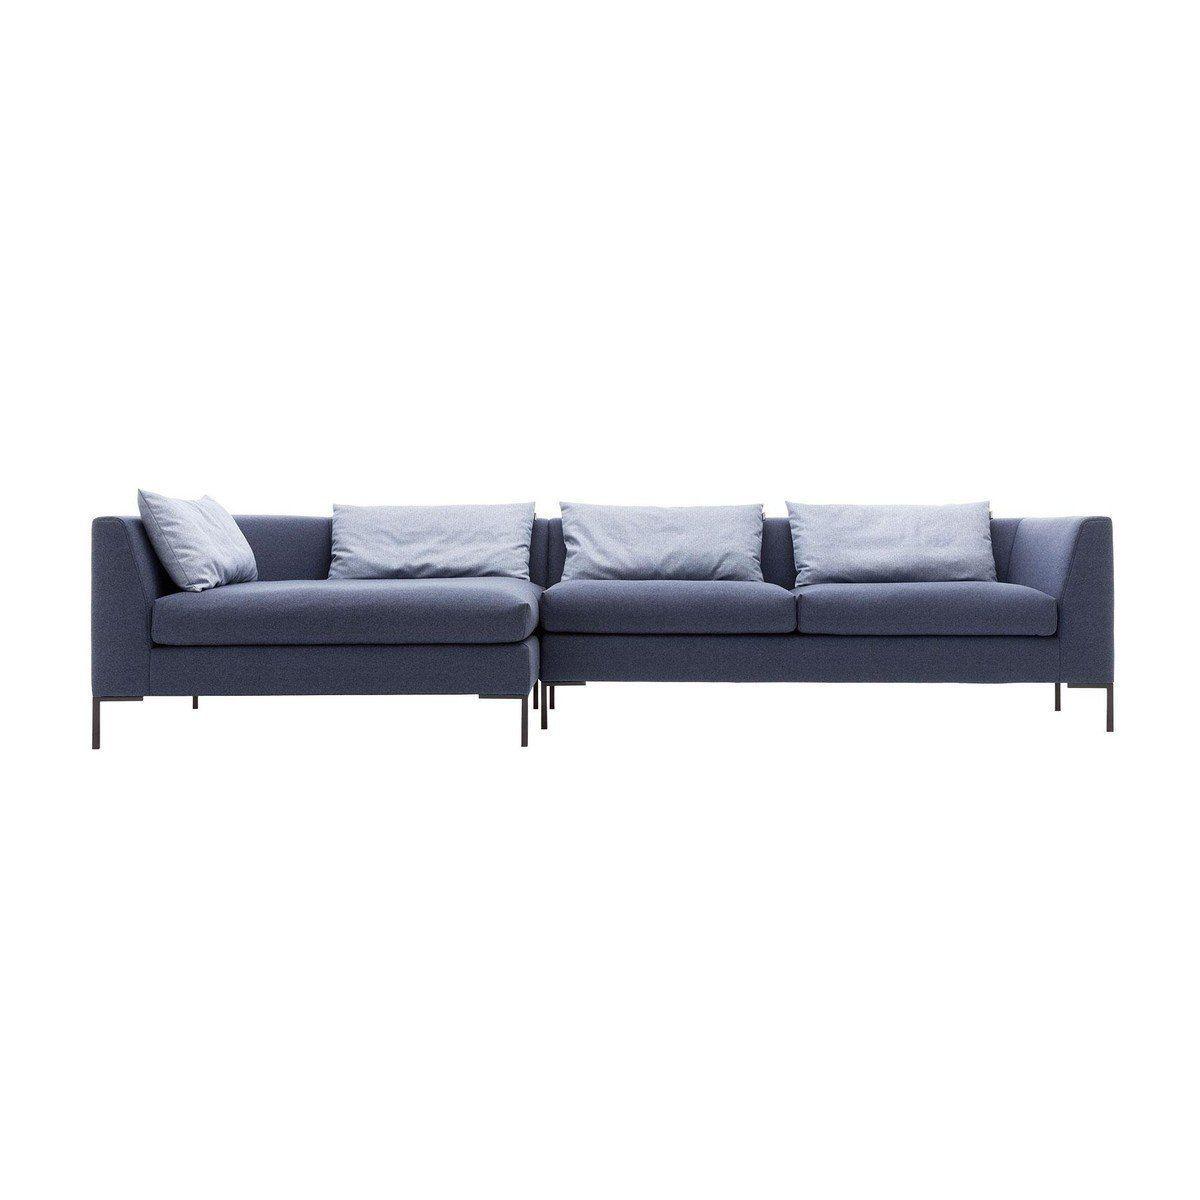 freistil 165 Sofa | freistil Rolf Benz | AmbienteDirect.com